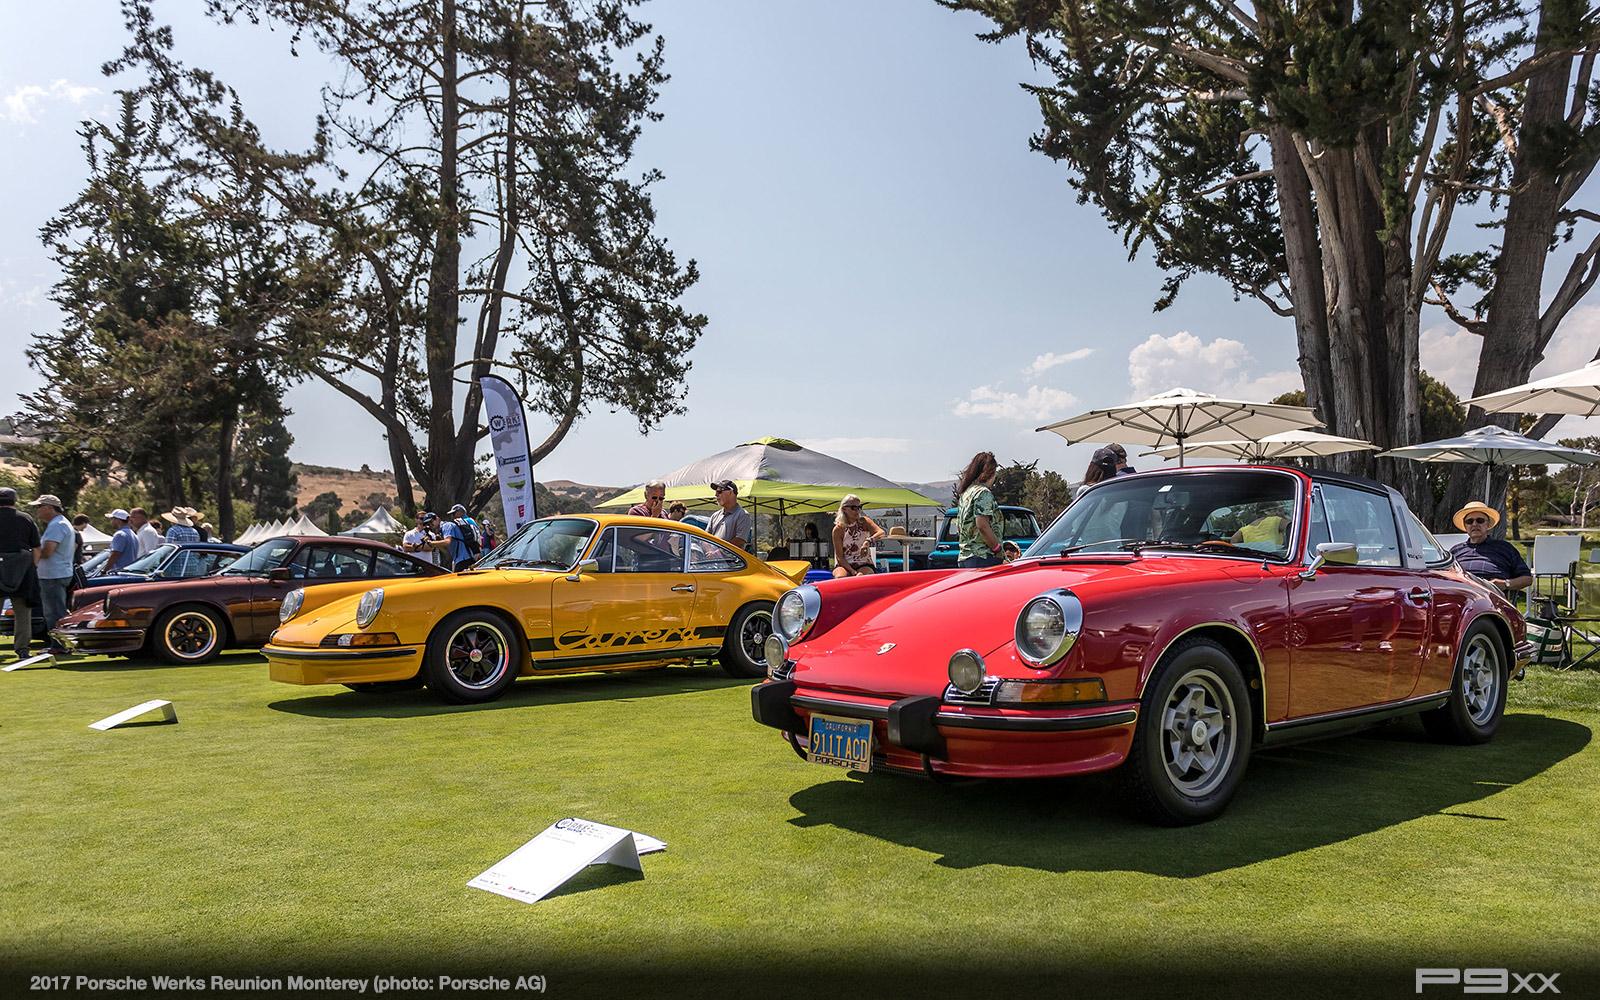 high_monterey_historics_mazda_raceway_laguna_seca_monterey_2017_porsche_ag-2